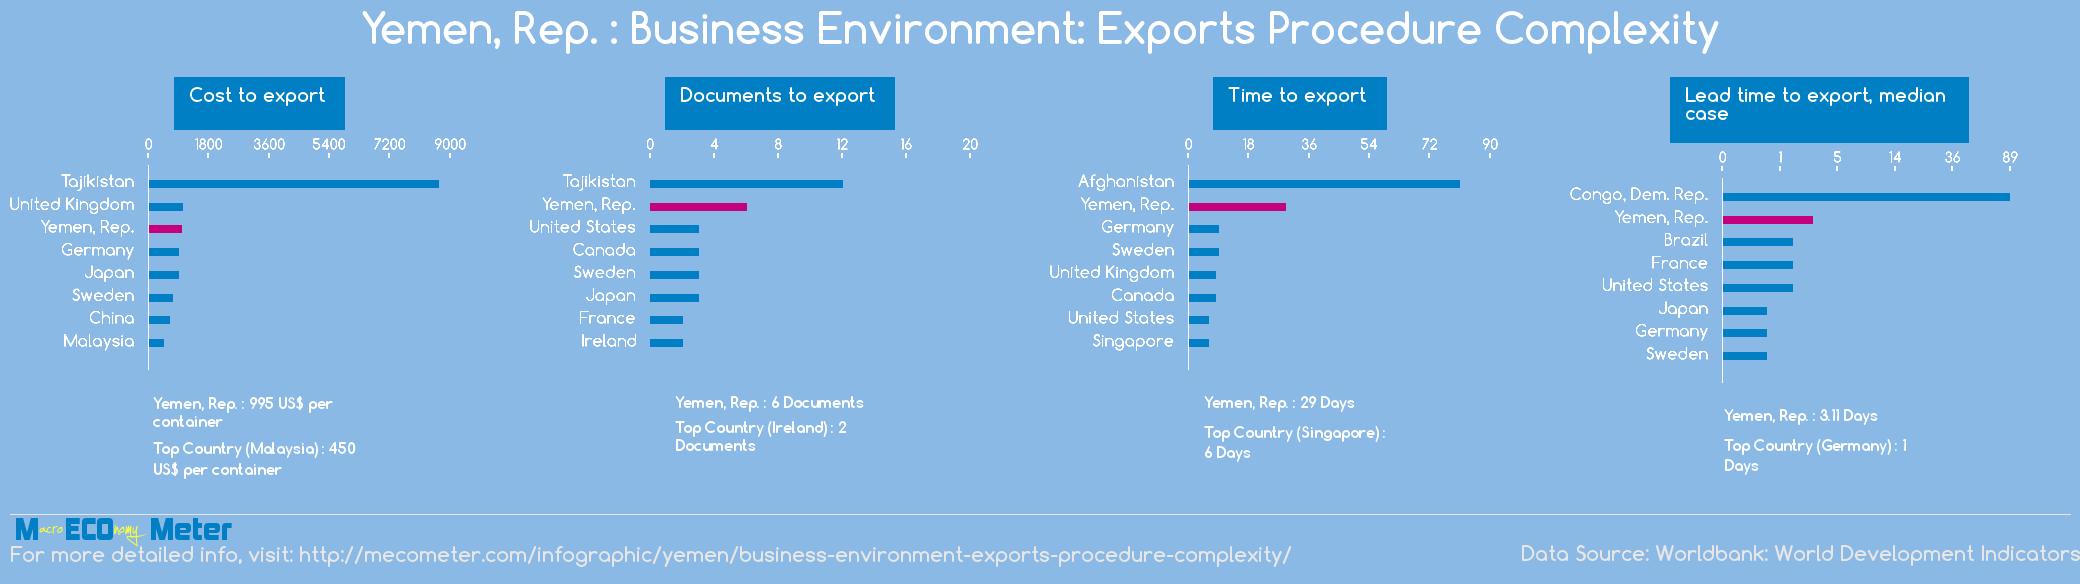 Yemen, Rep. : Business Environment: Exports Procedure Complexity